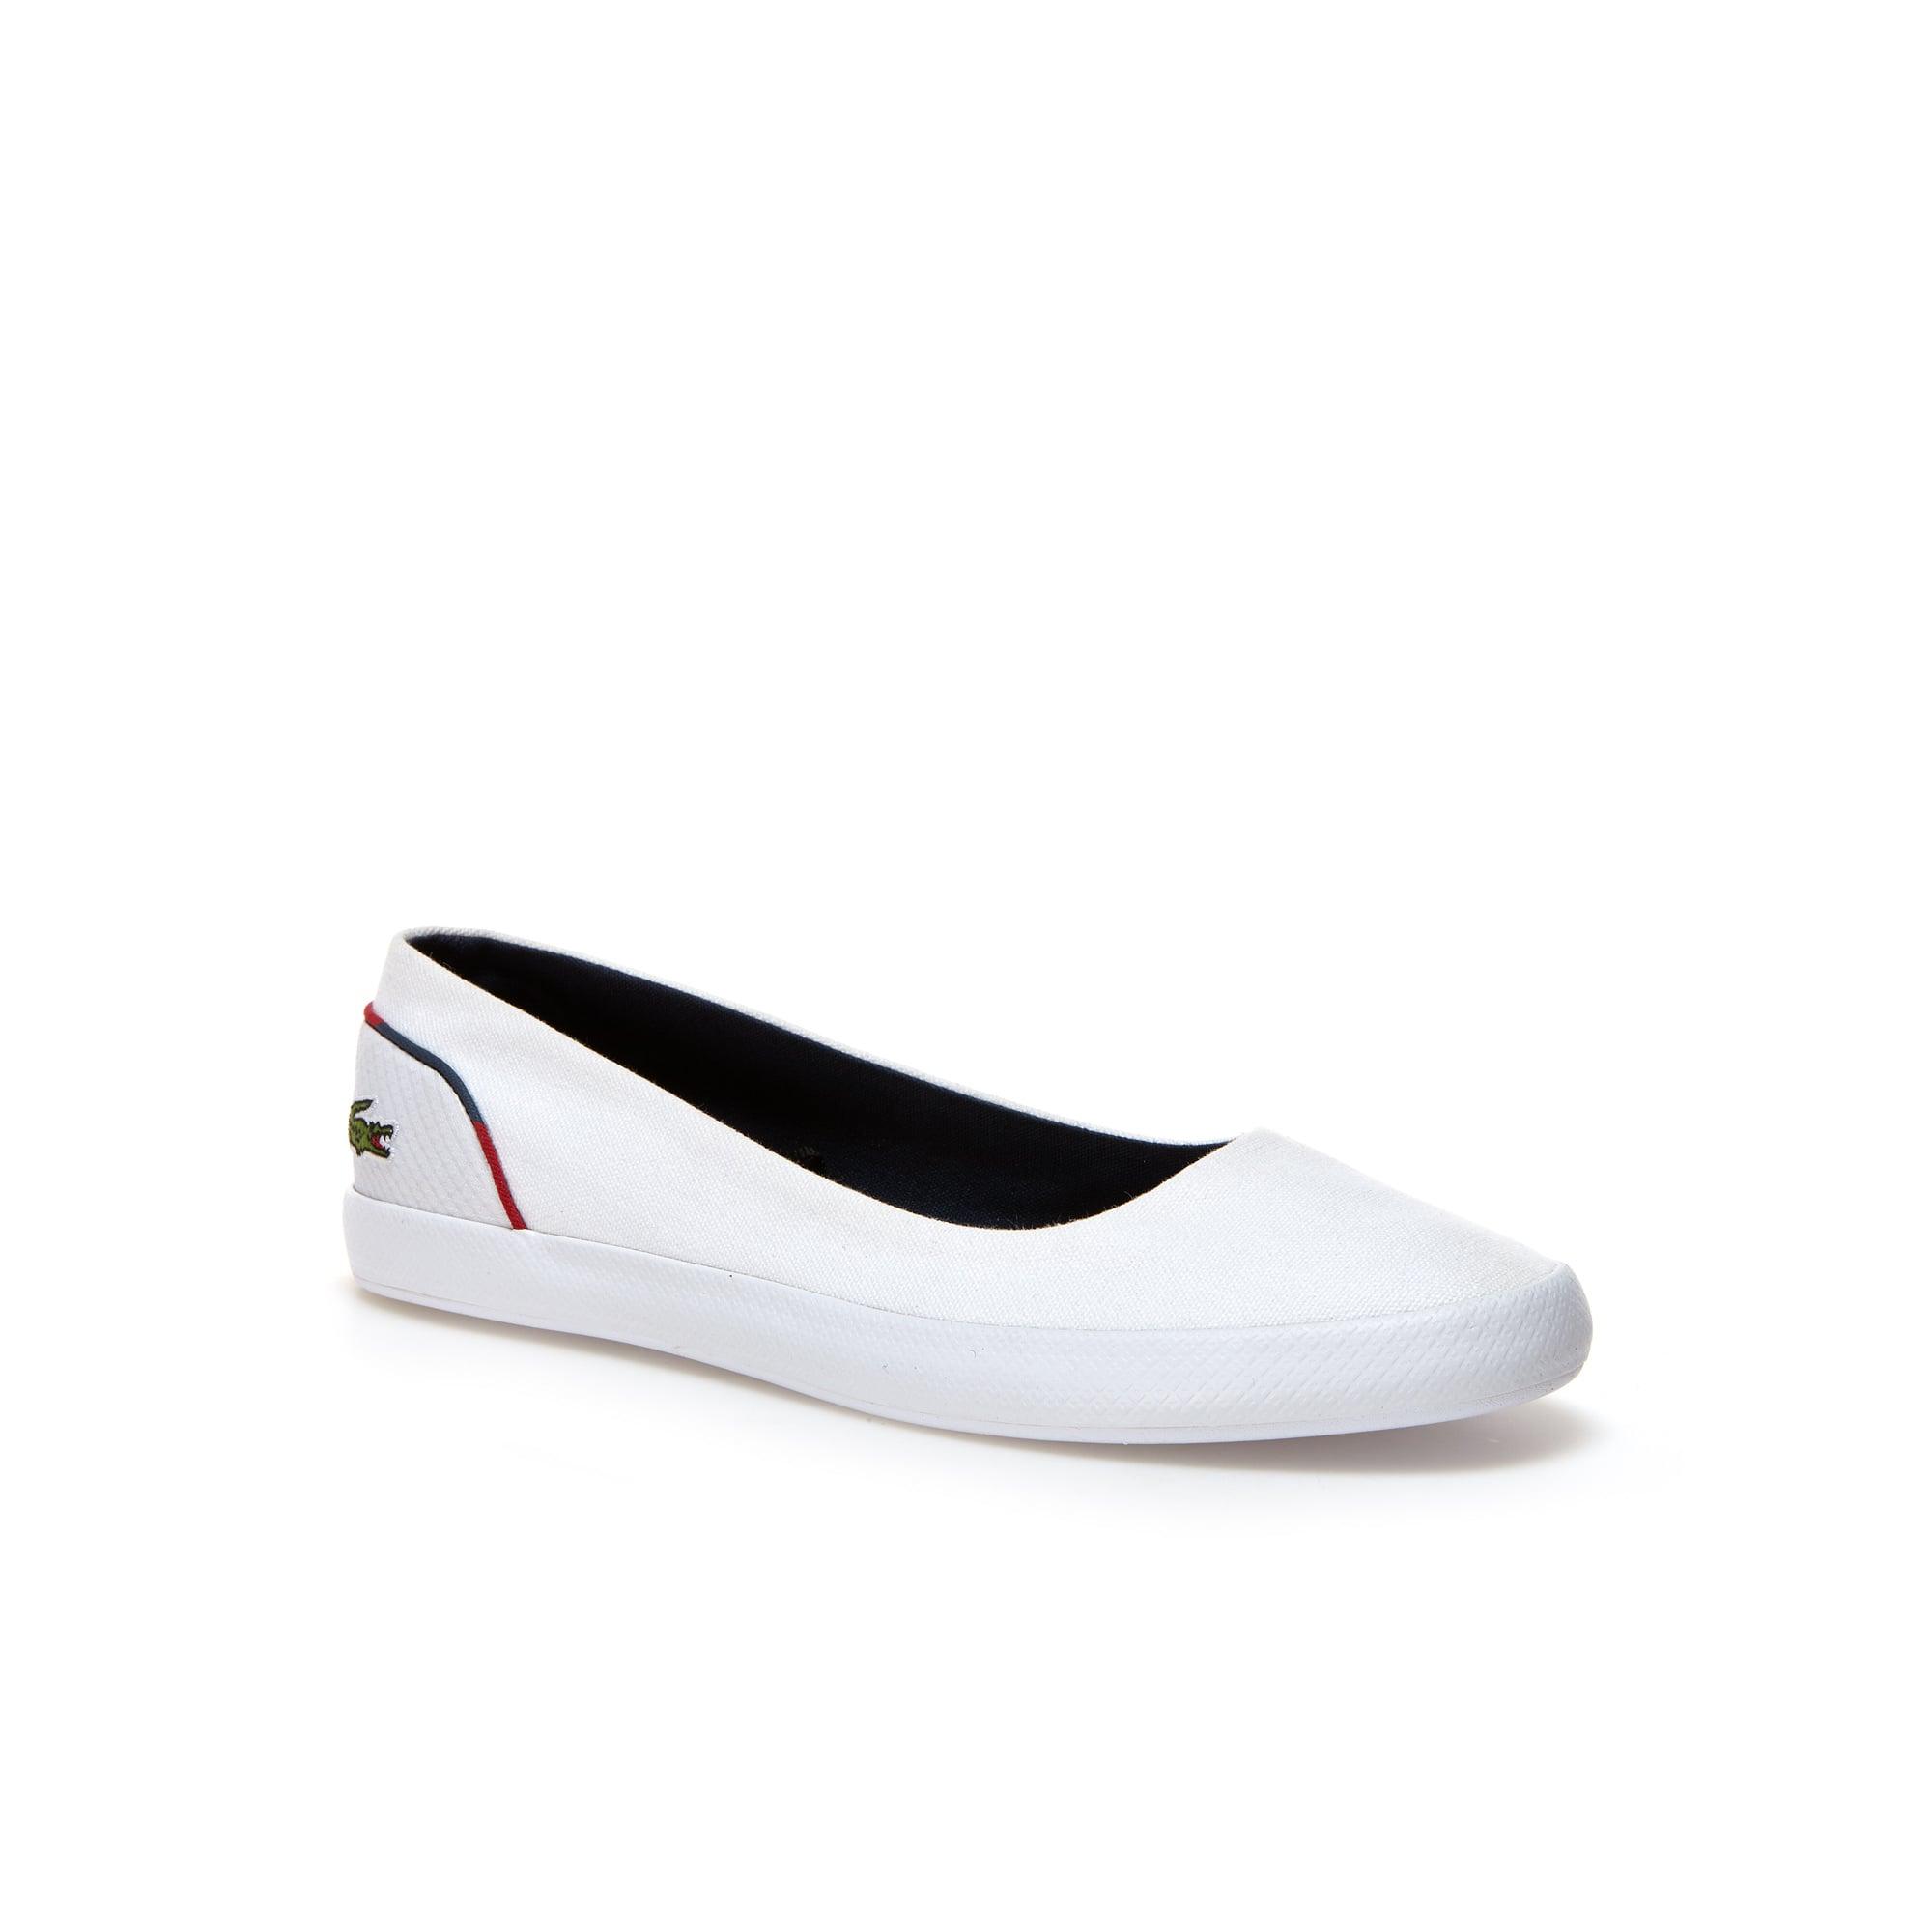 Women's Lancelle Ballerina Canvas Slip-ons